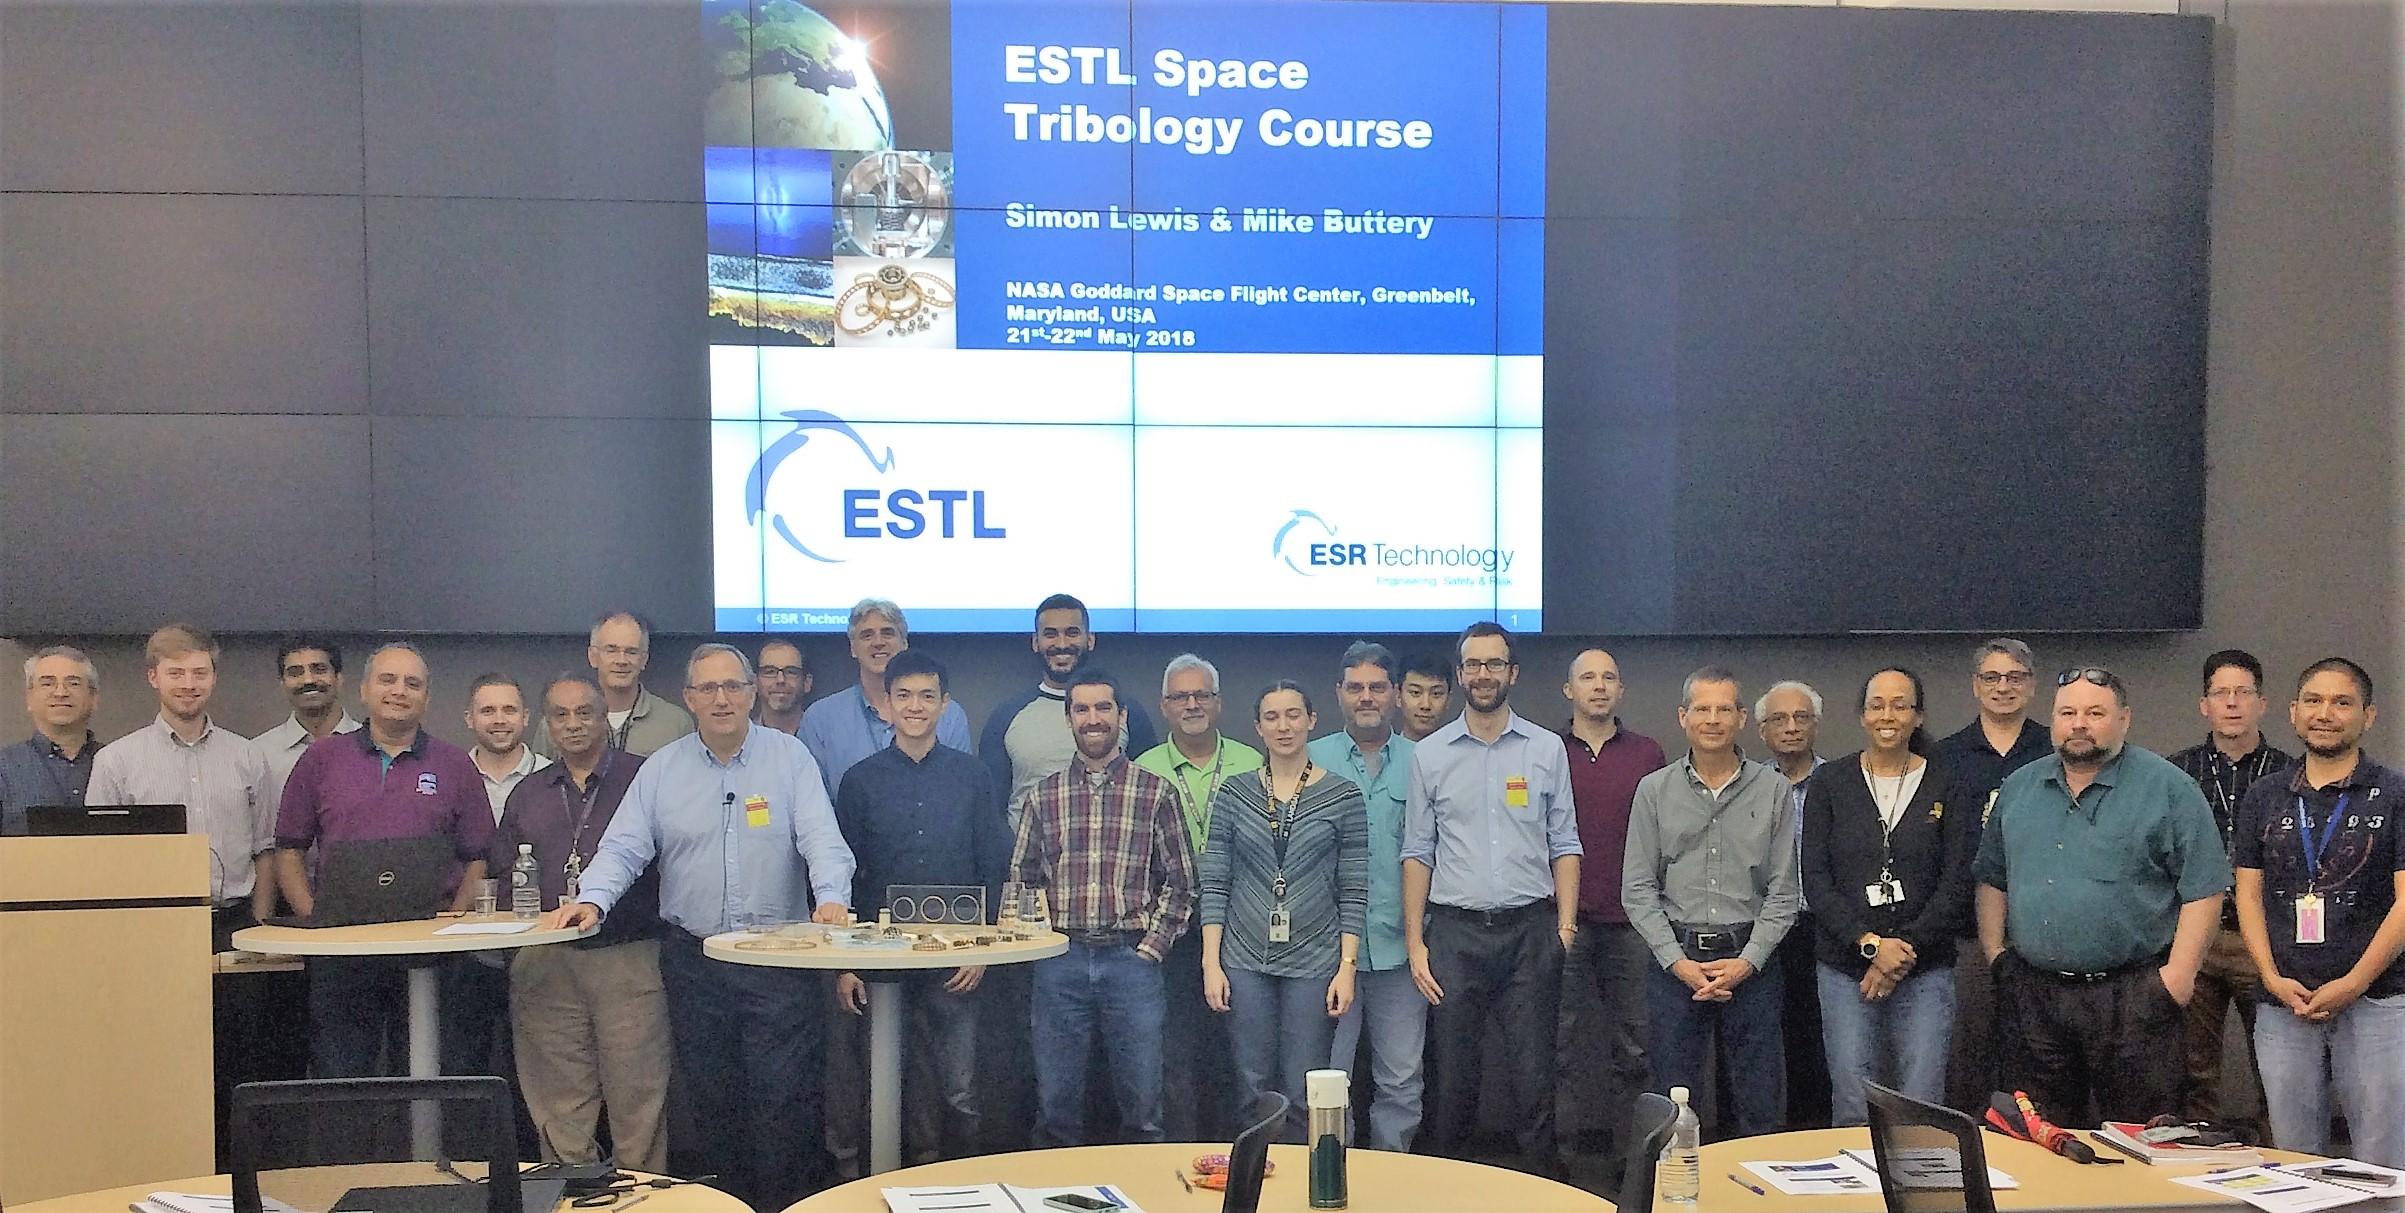 ESR Technology - ESTL presents training courses and AMS